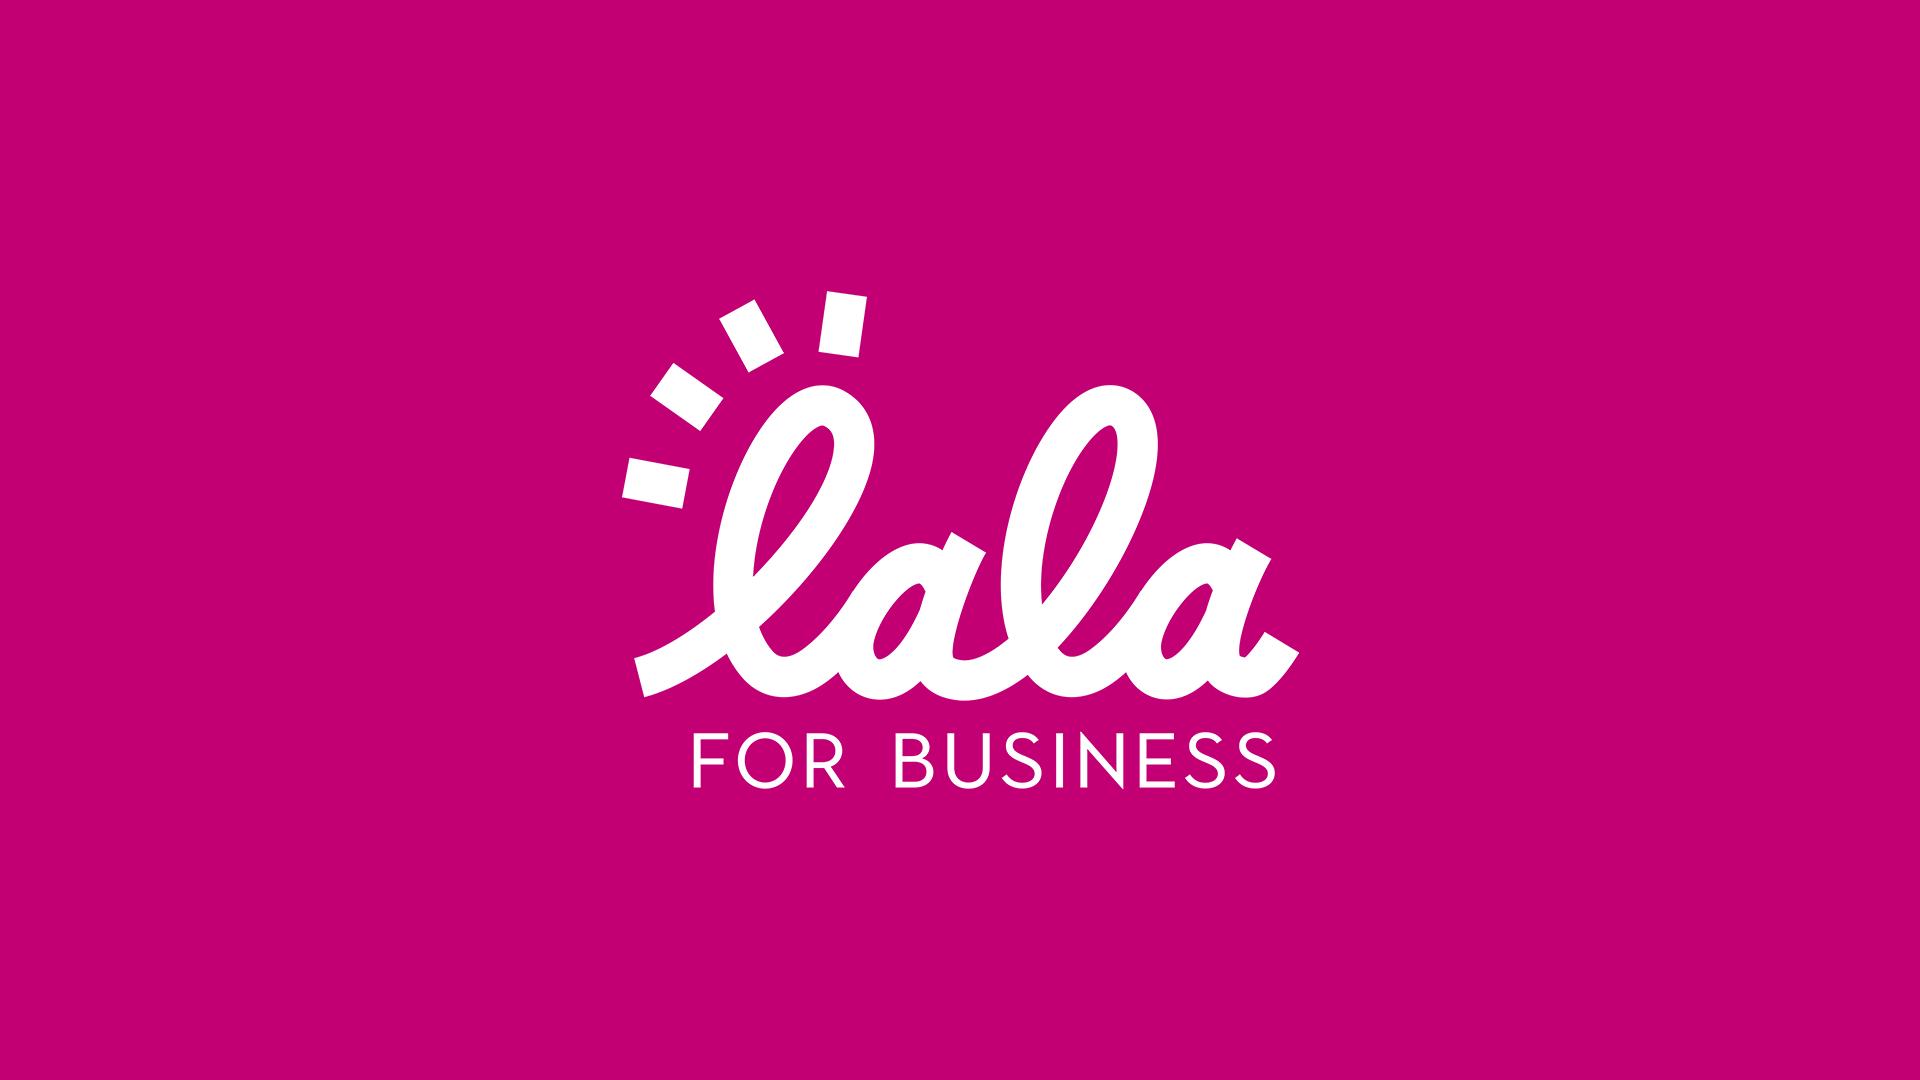 Business Coach, Mentor & Design, Print & Branding Expert, Perth WA